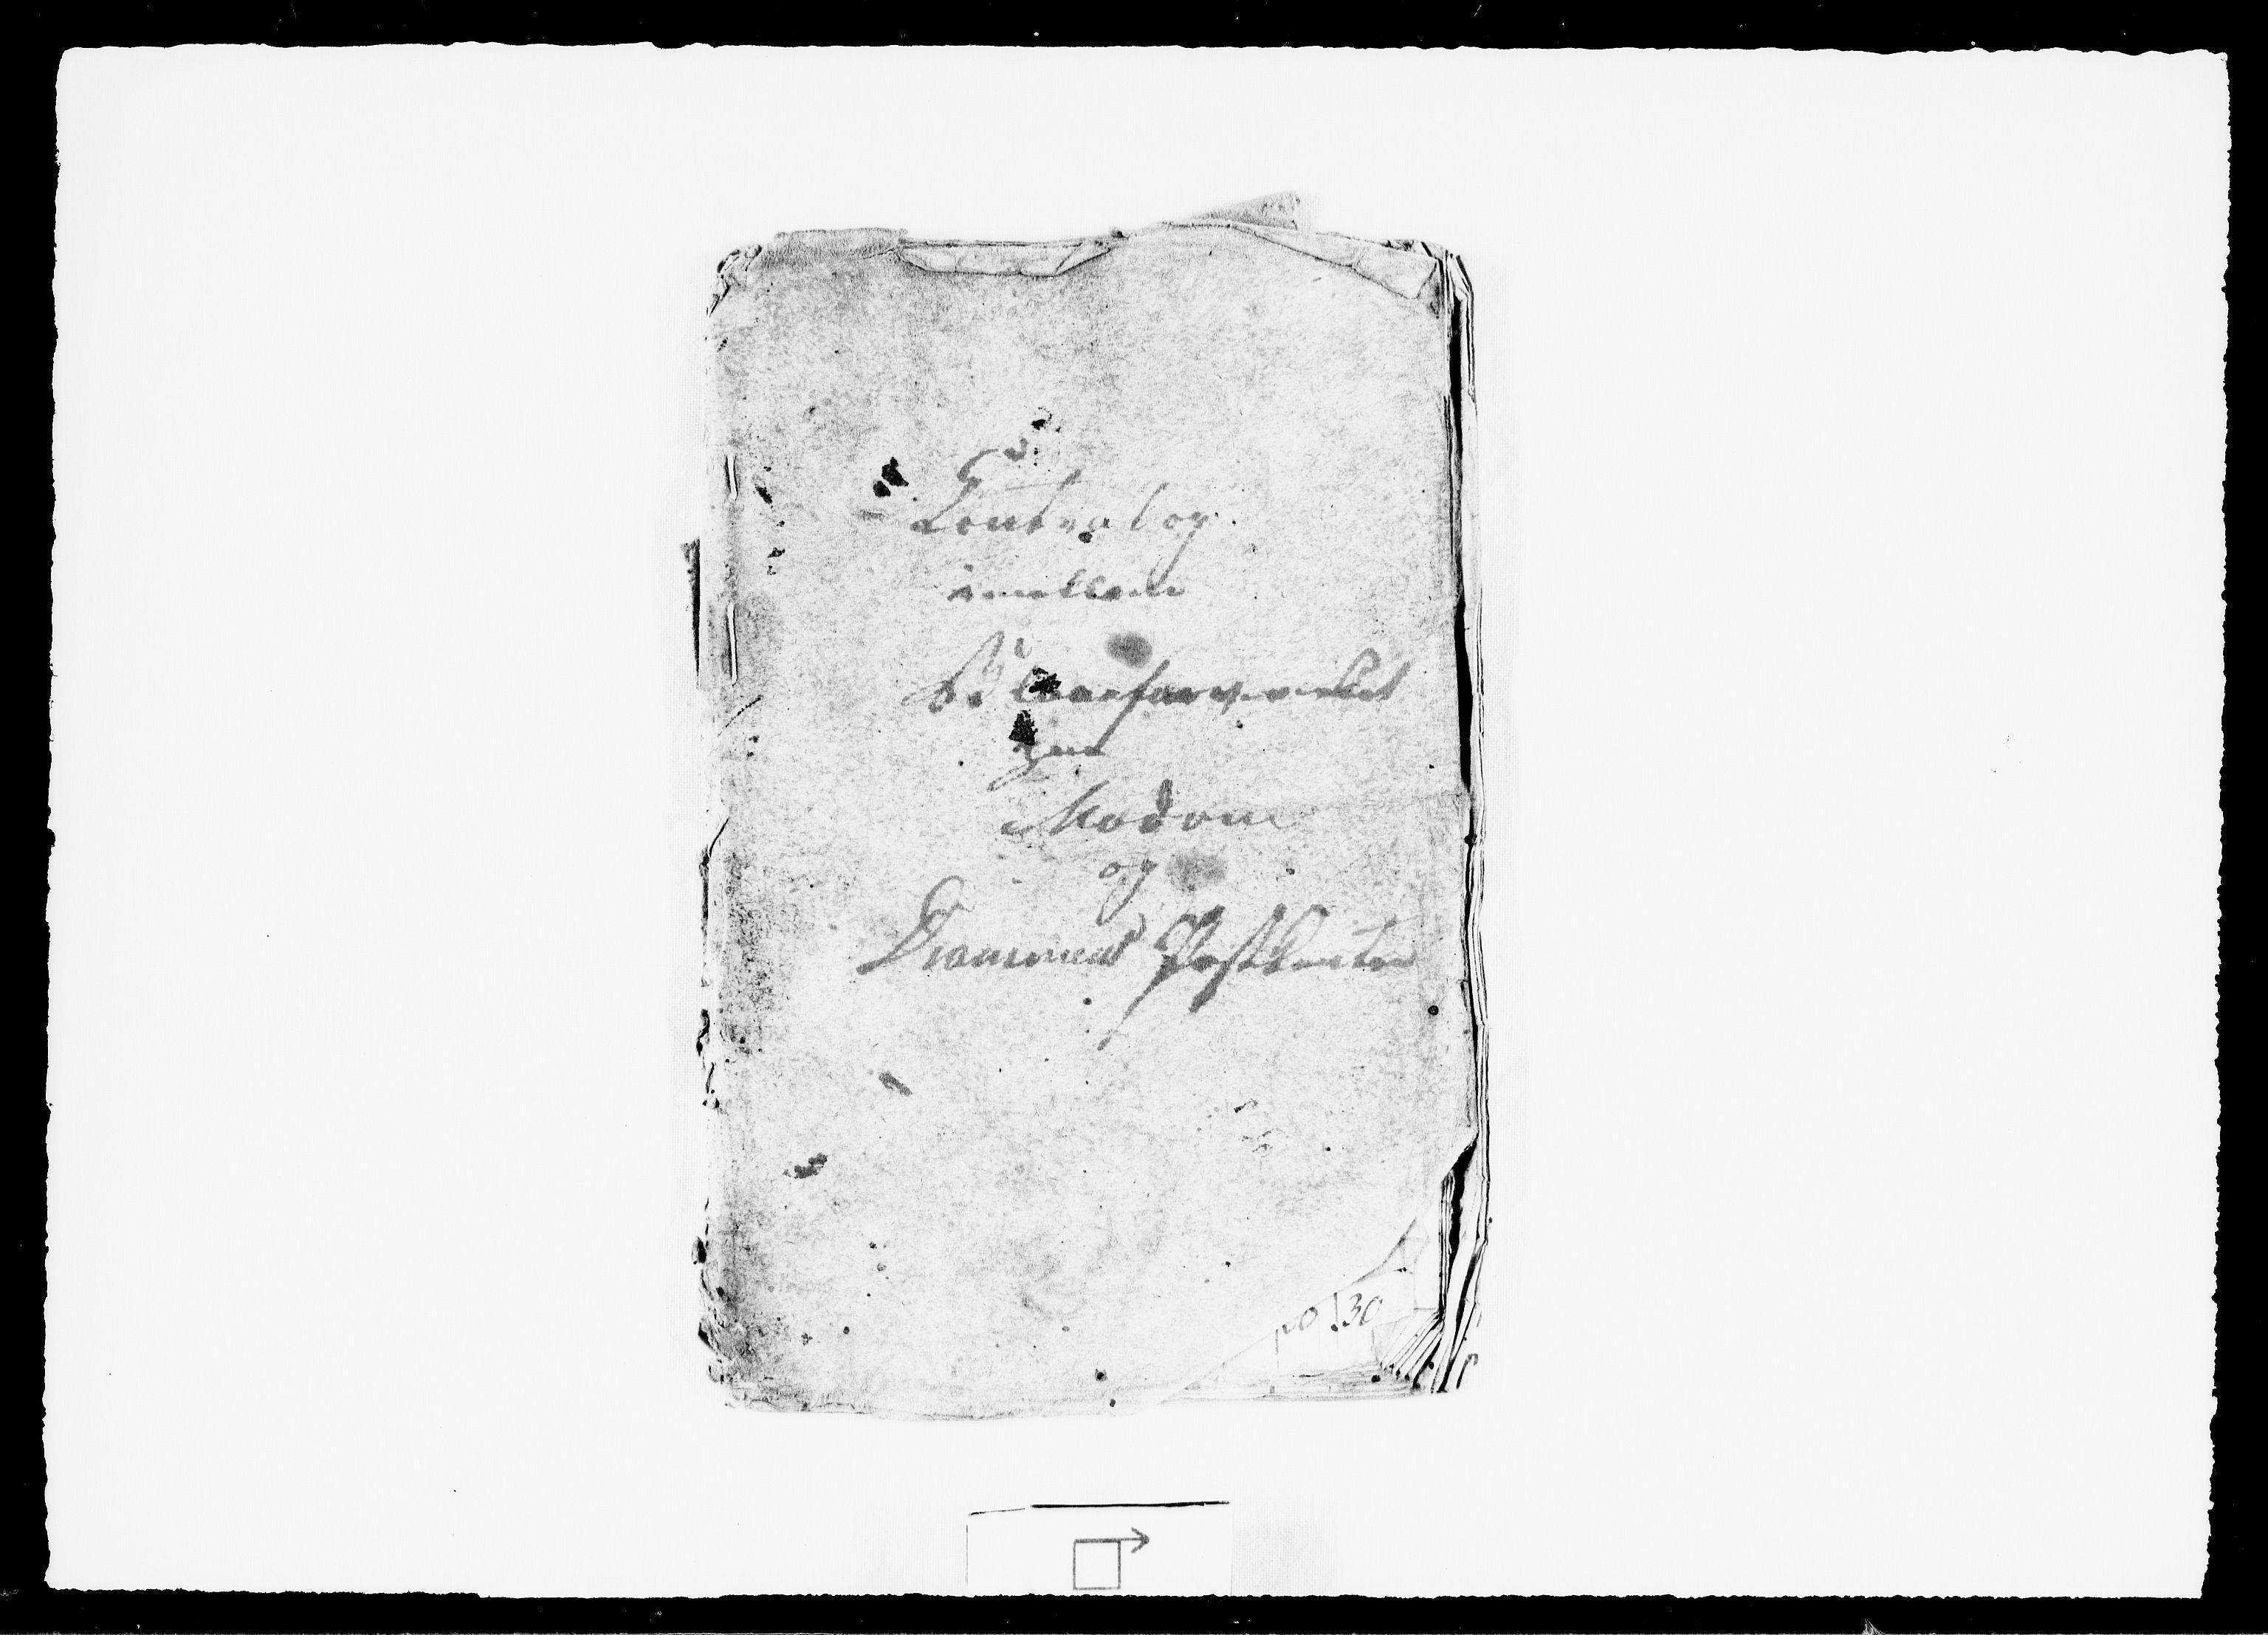 RA, Modums Blaafarveværk, G/Gd/Gdc/L0244, 1827-1840, s. 2